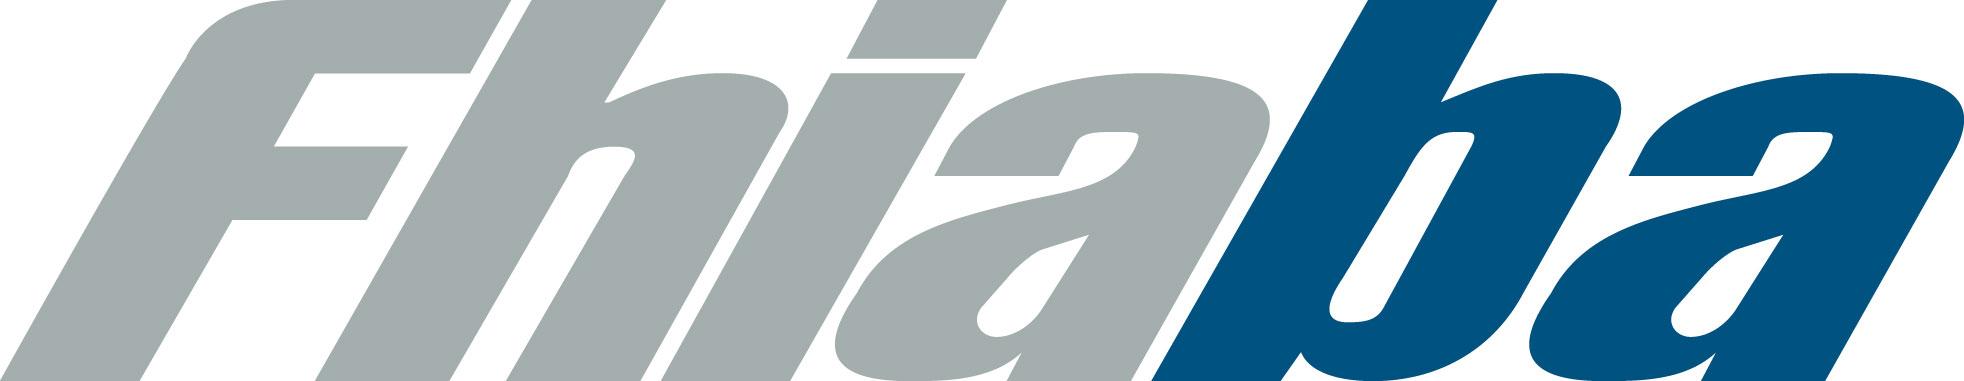 Fhiaba_logo